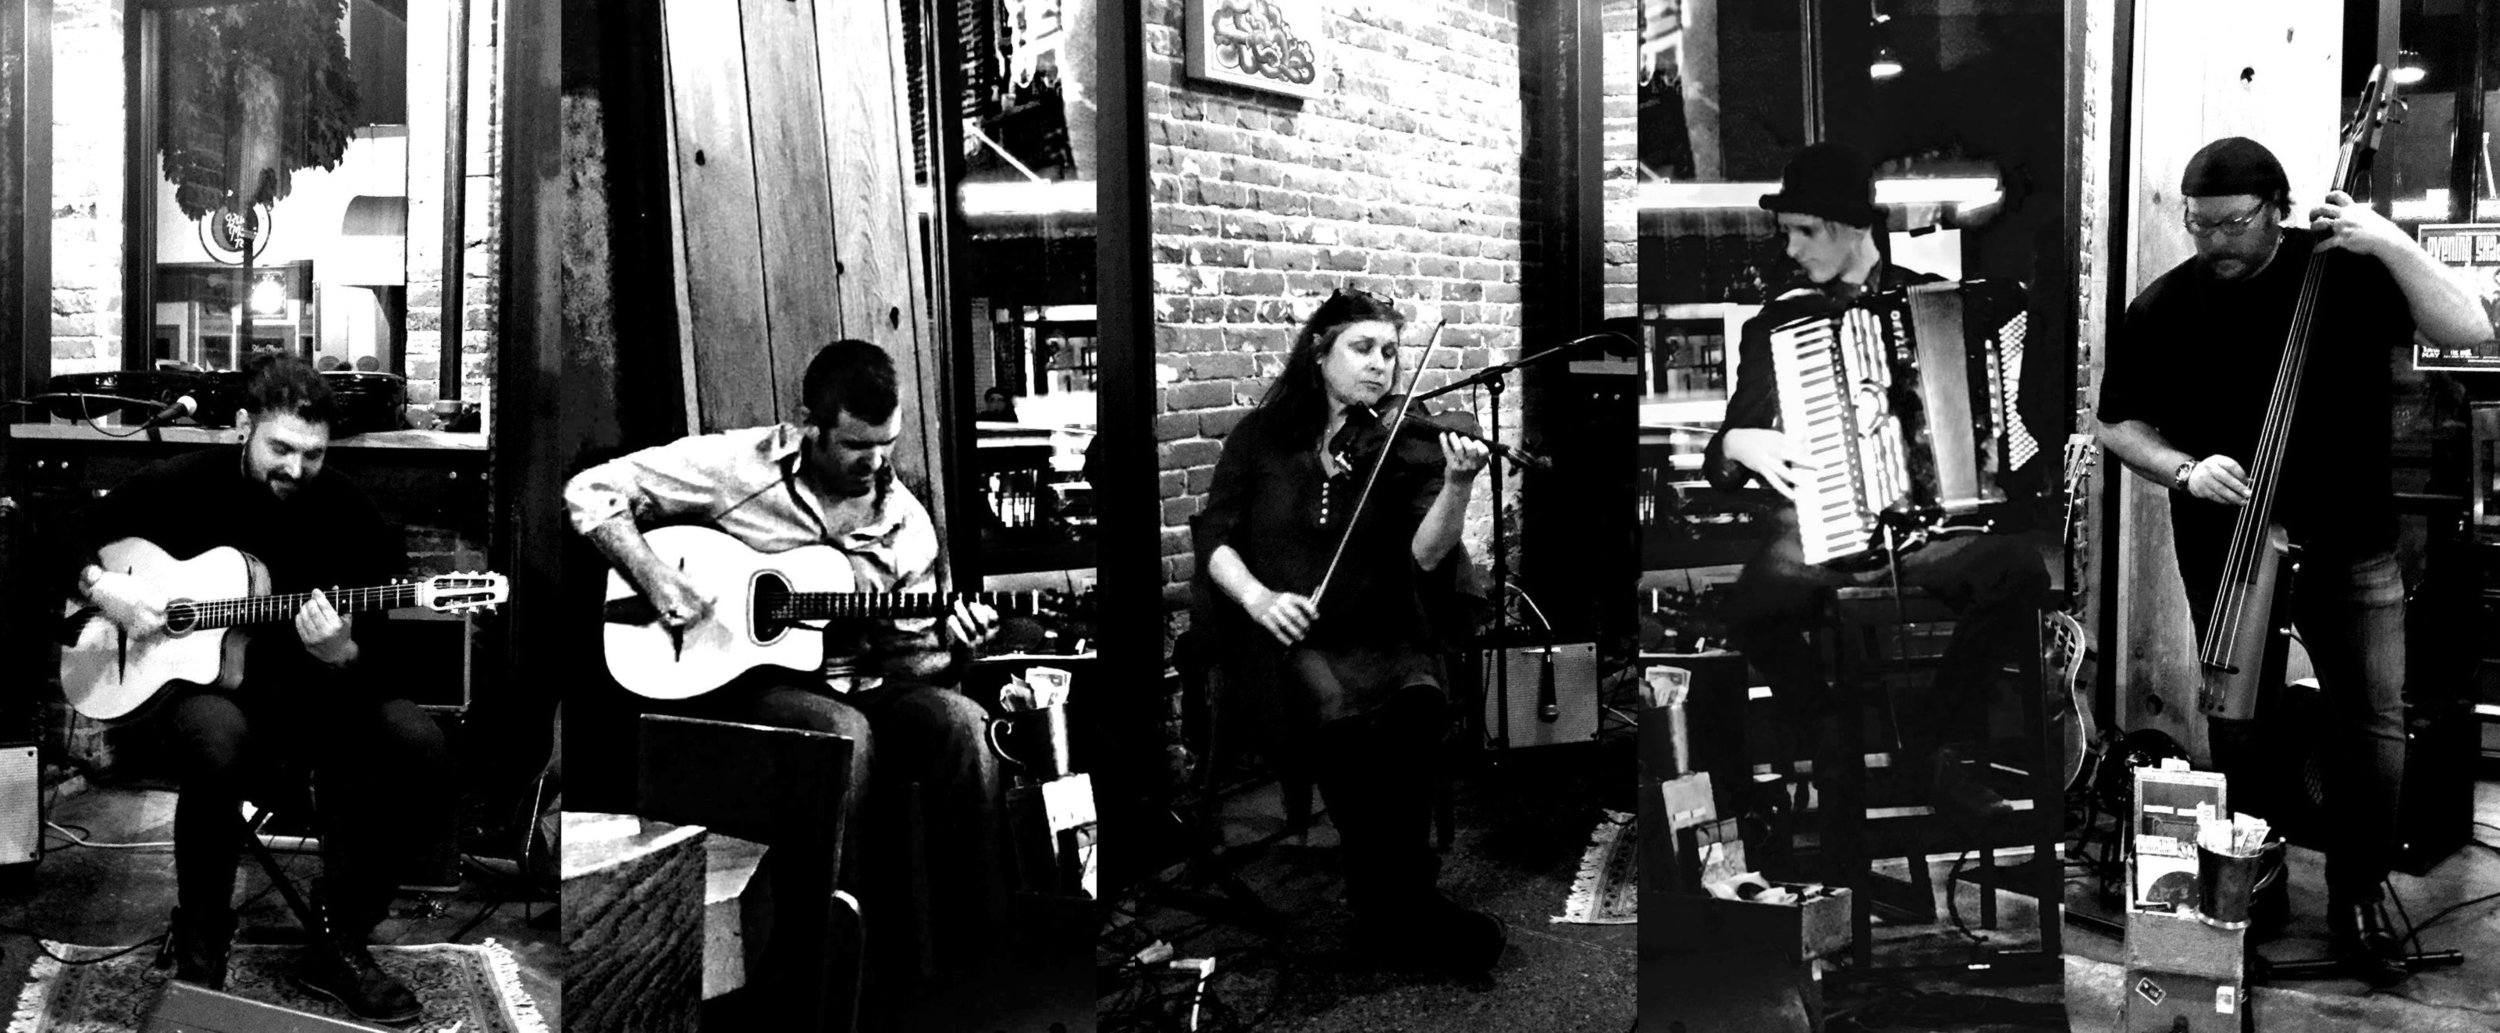 Giardinelli HC Quintet - The Haul.jpg